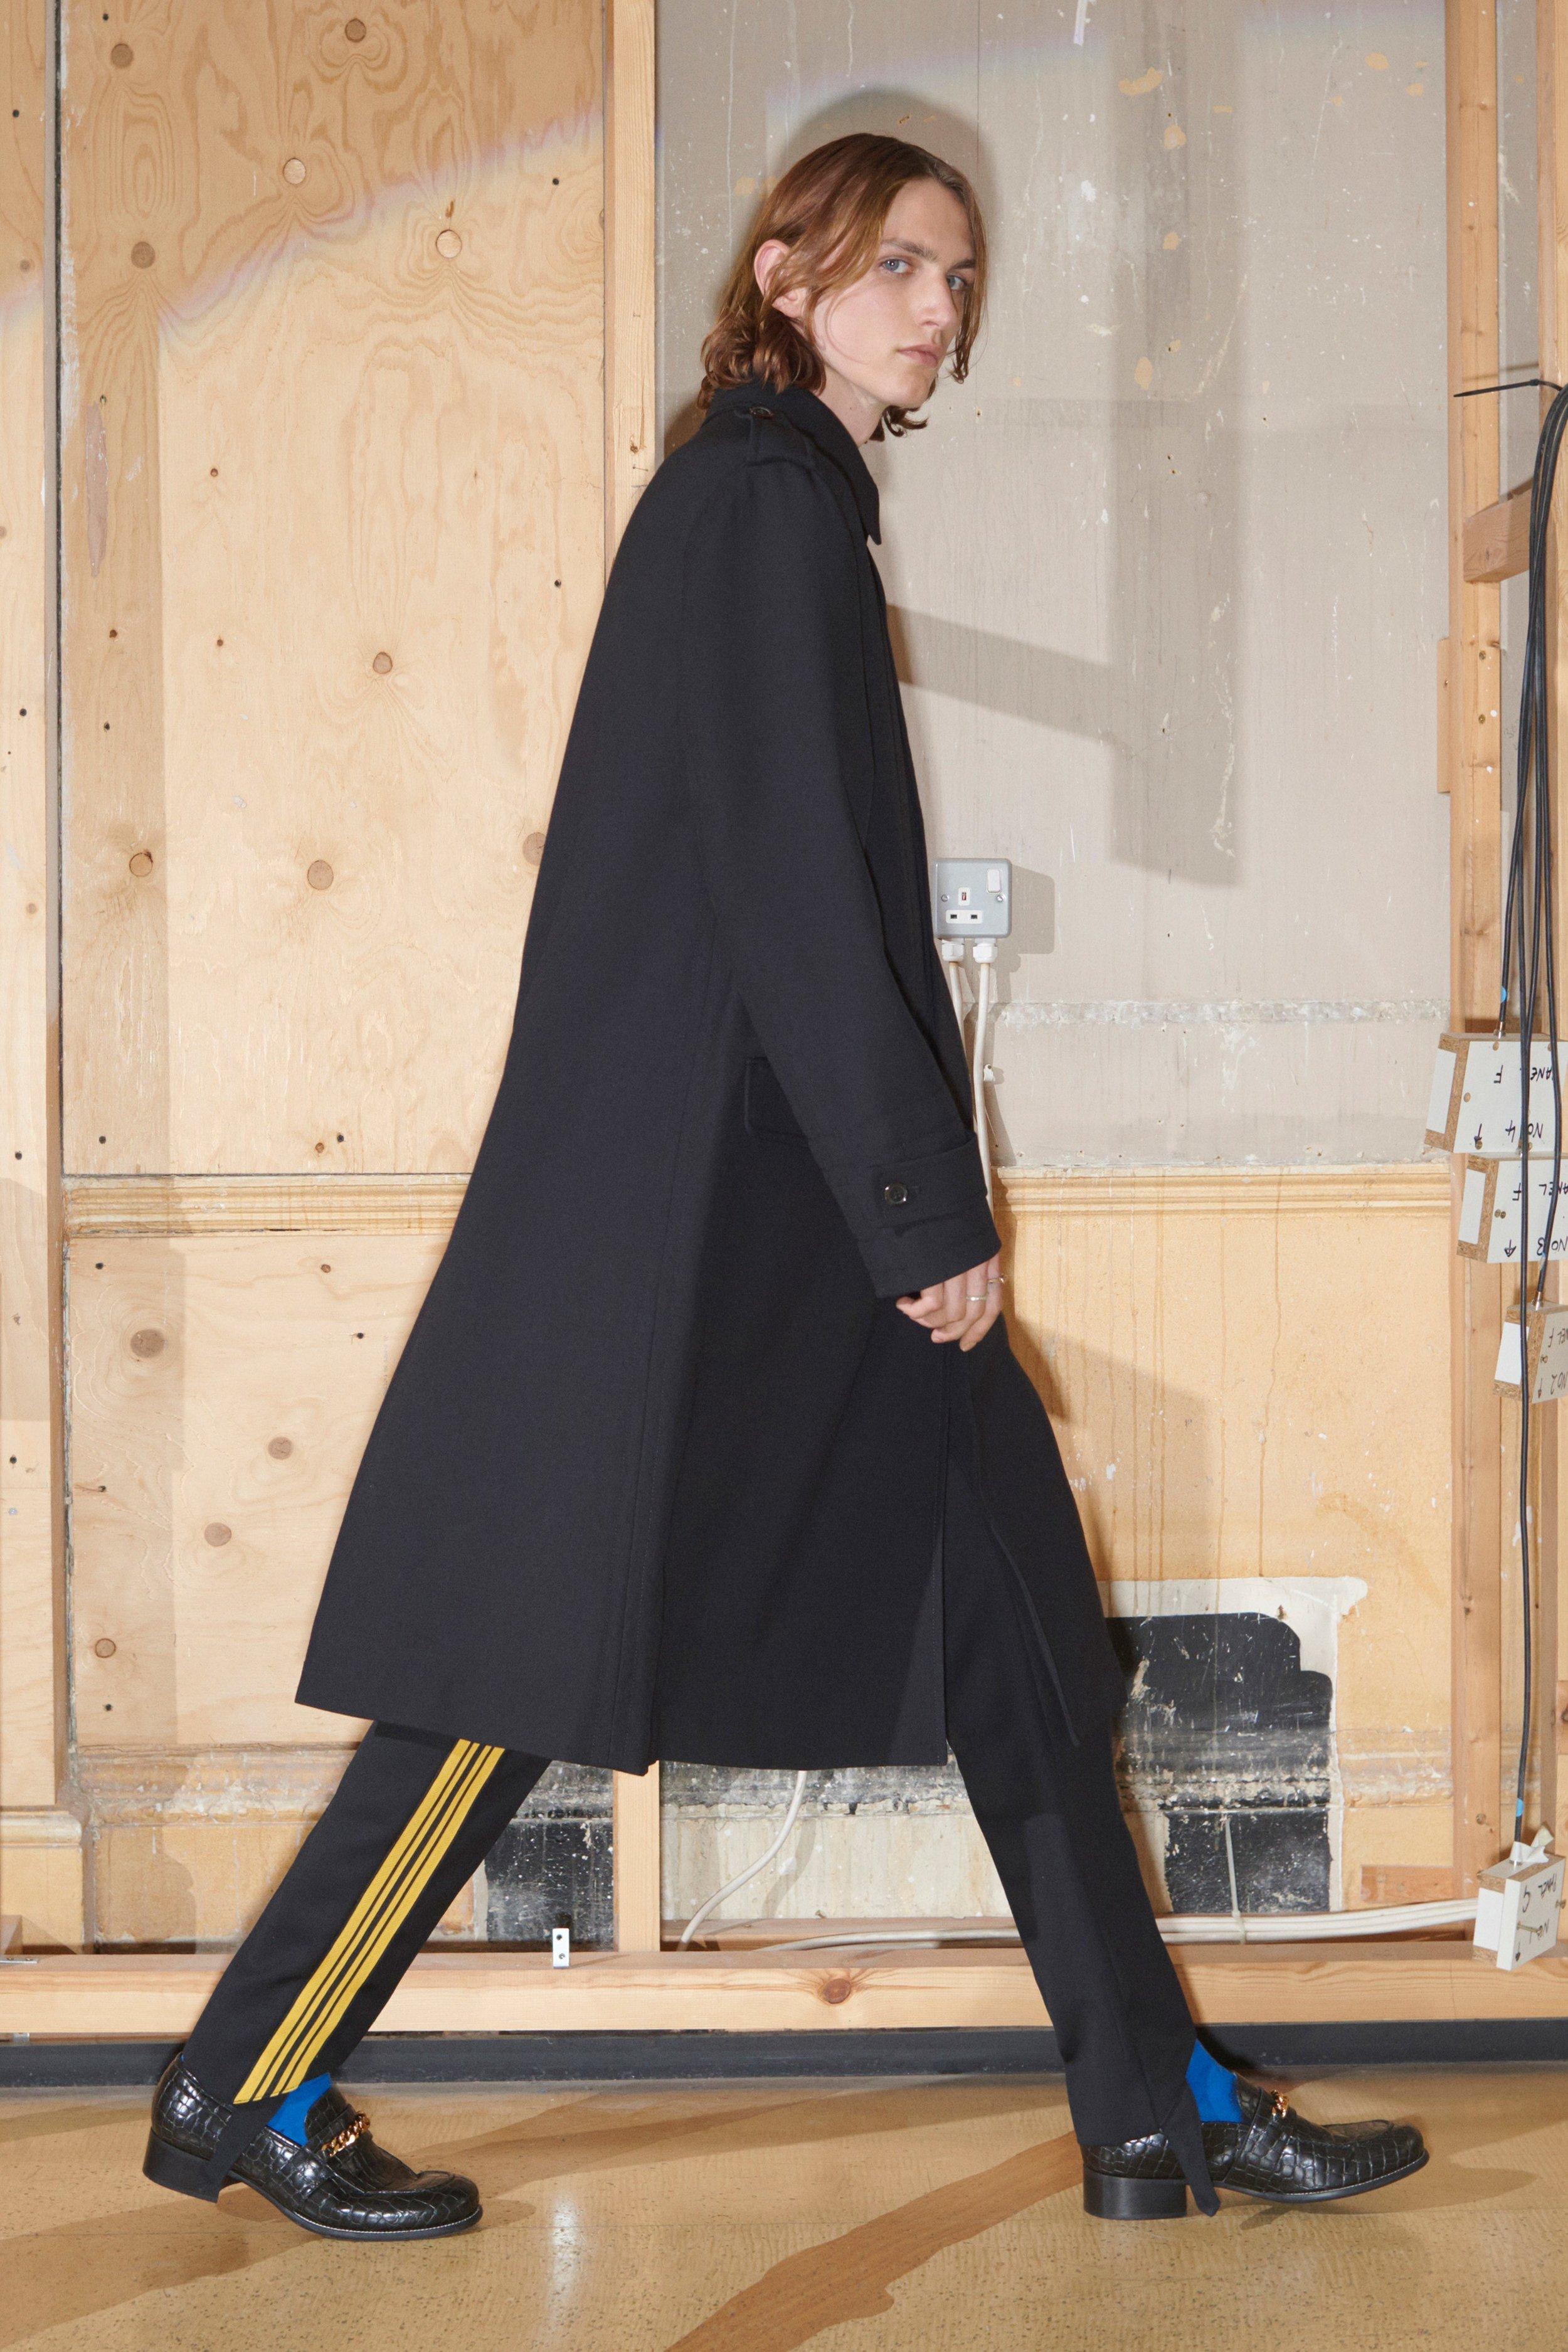 00023-Stella-McCartney-Vogue-Menswear-2019-pr.jpg